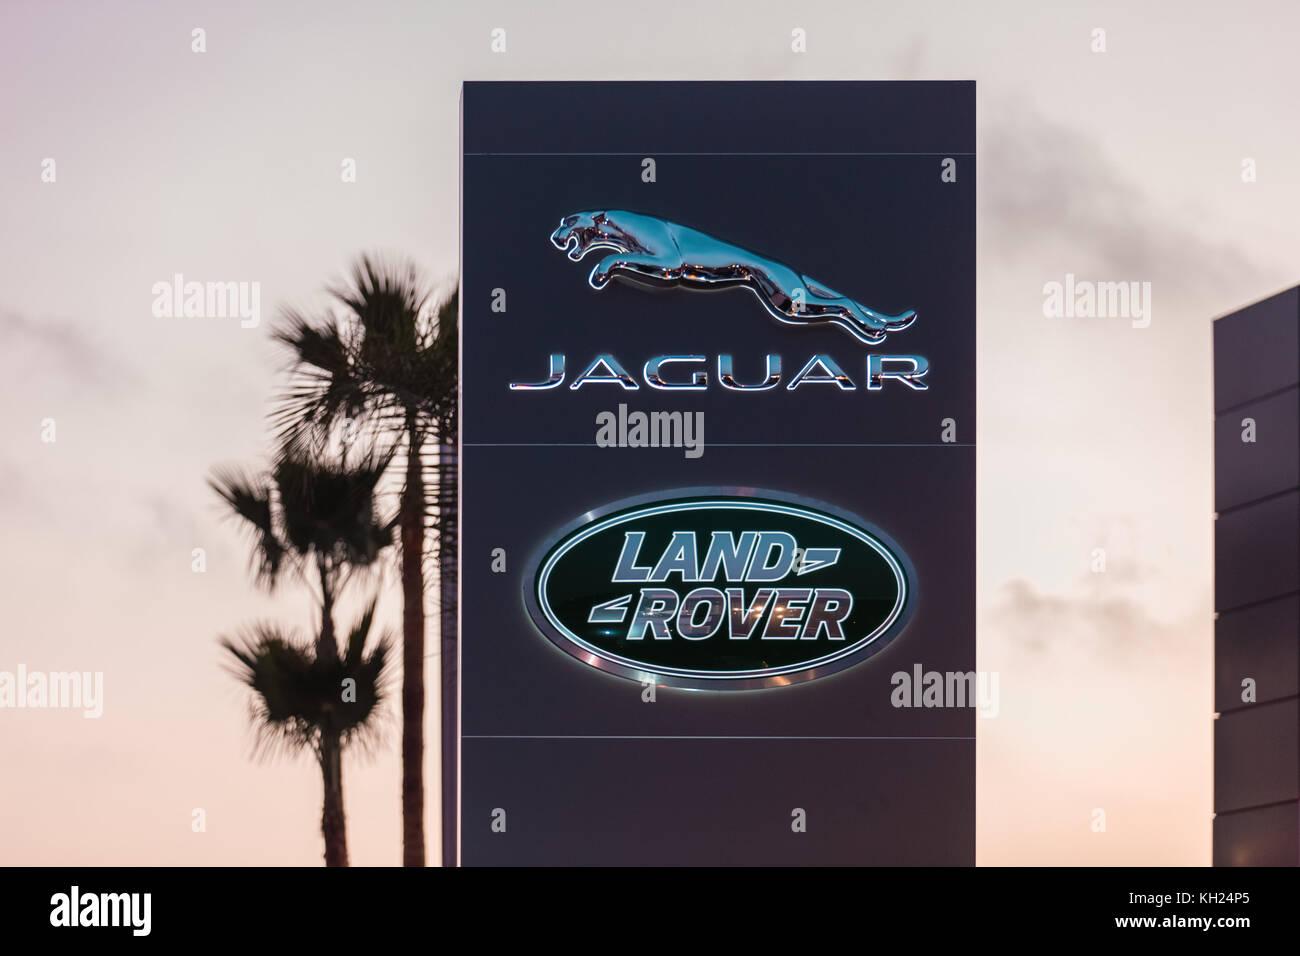 Jaguar and land Rover dealership sign, Rabat , Morocco - Stock Image